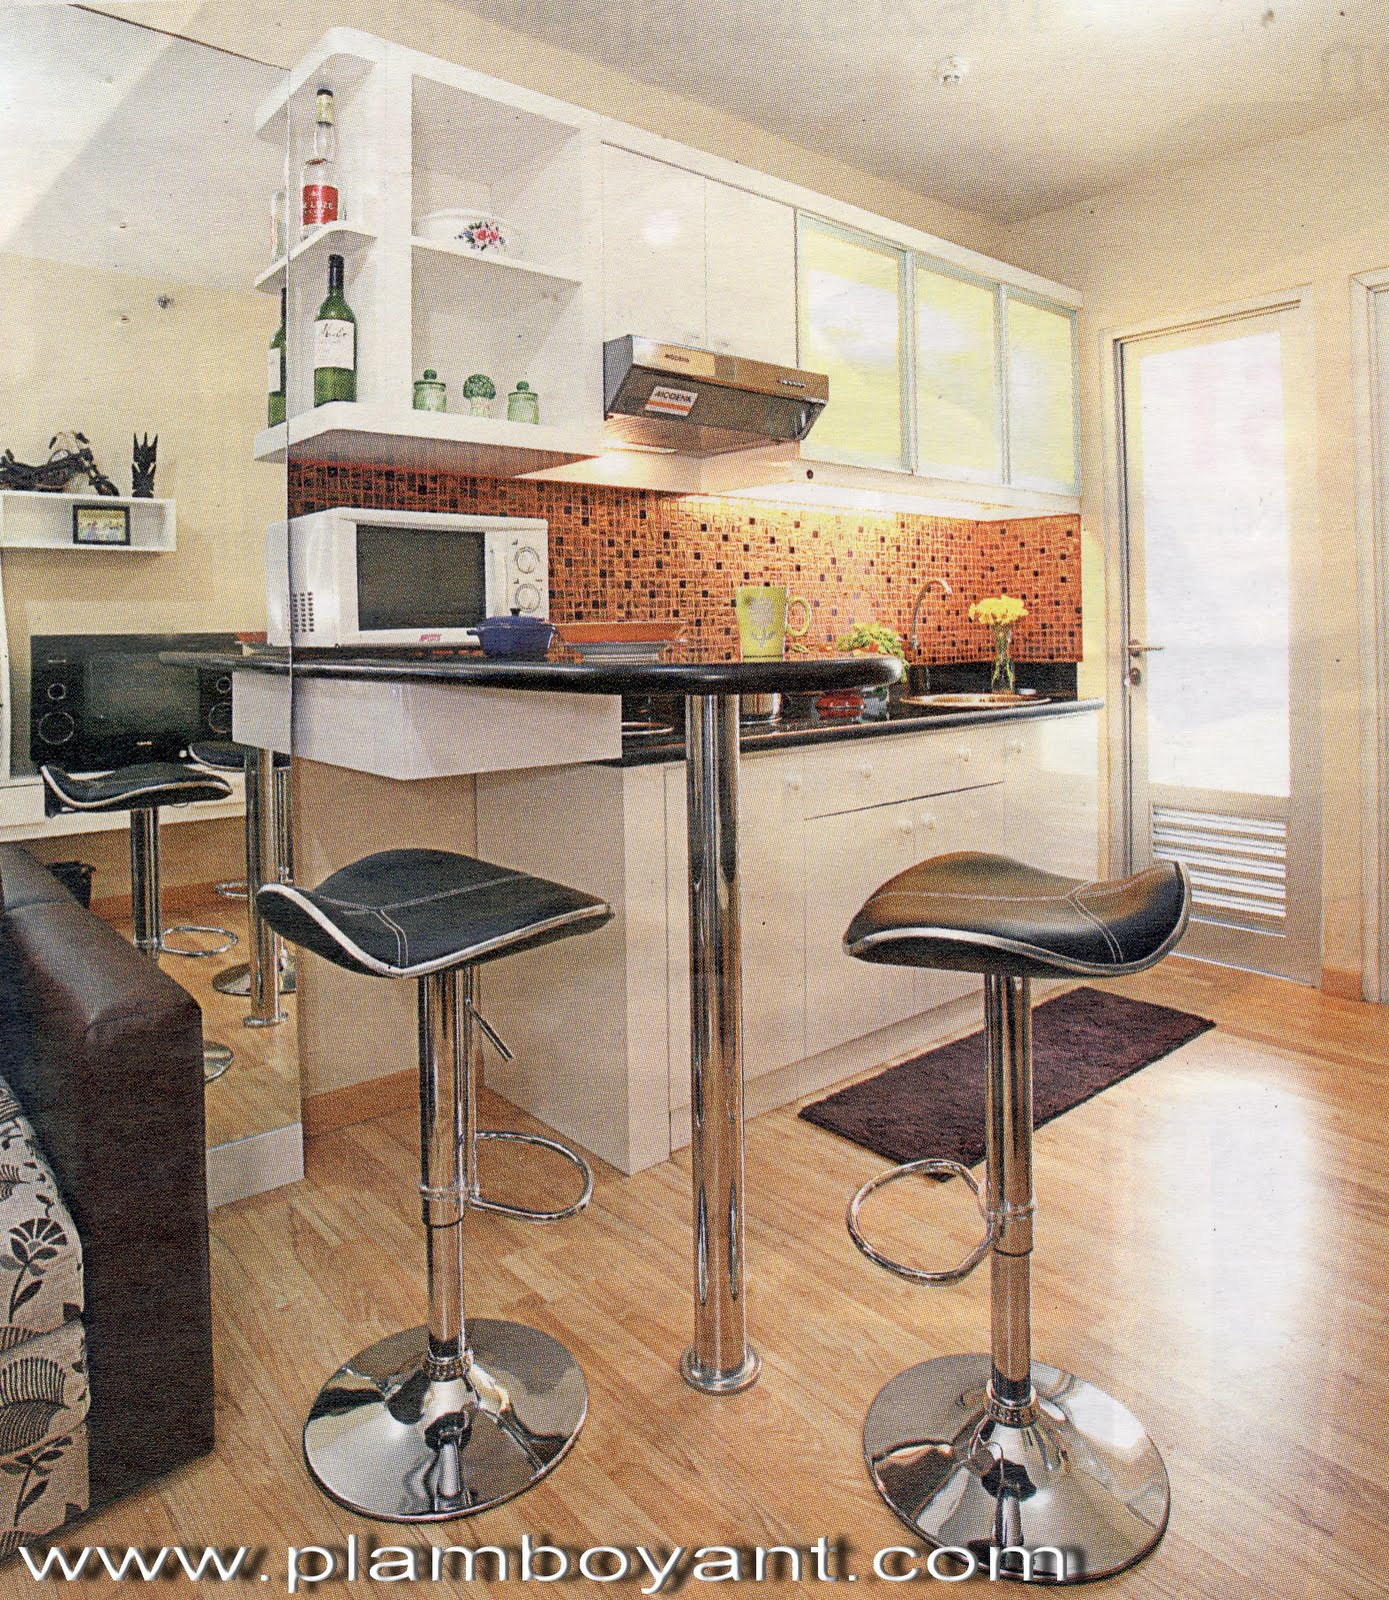 Mini Bar Kitchen: Toko Flamboyant: Kitchen Set & Mini Bar,Pantry,Kamar Set